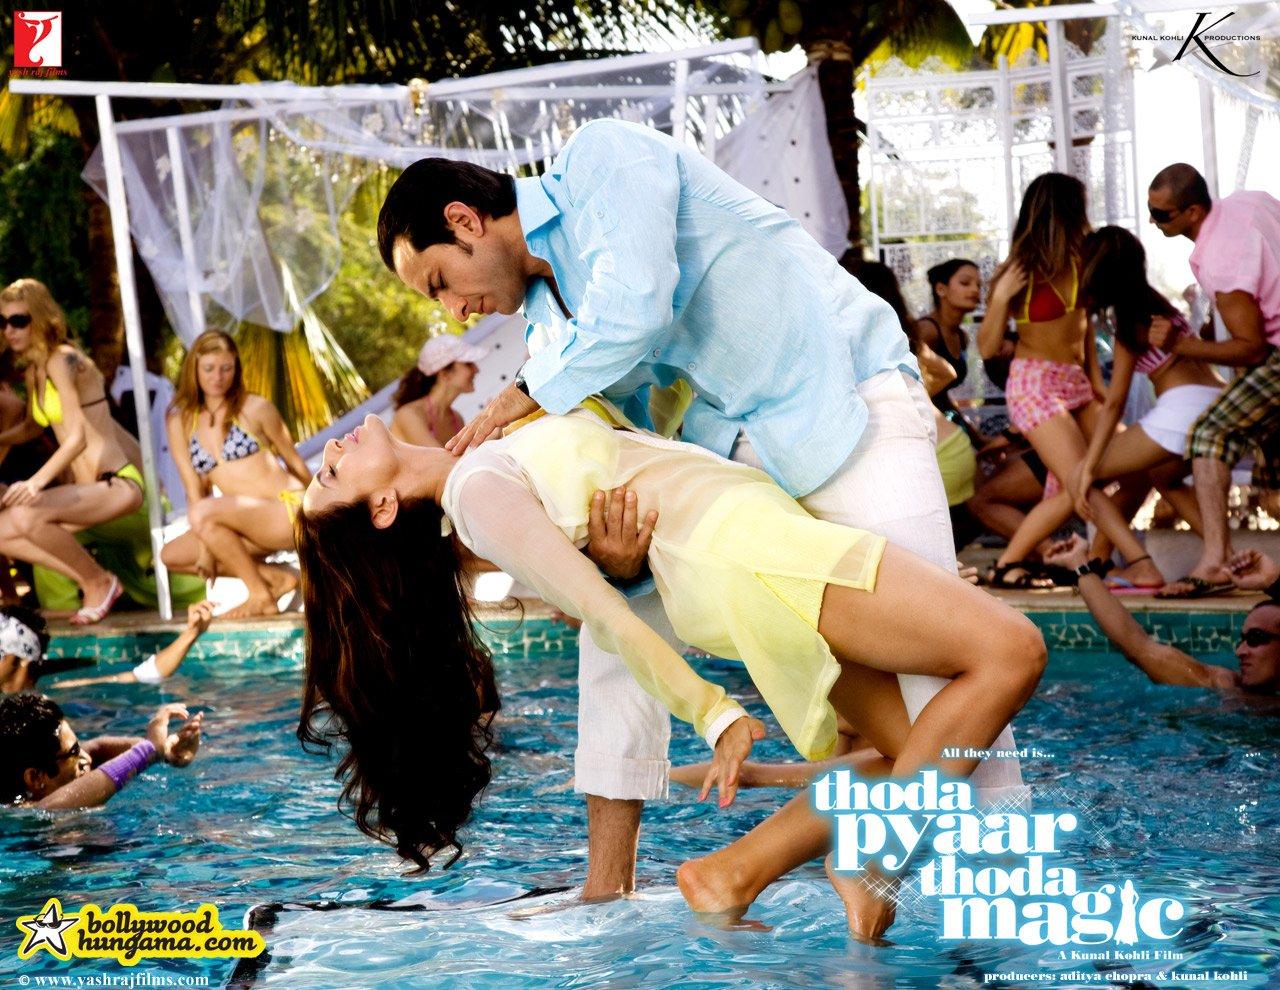 http://i.indiafm.com/posters/movies/08/thodapyaarthodamagic/still30.jpg